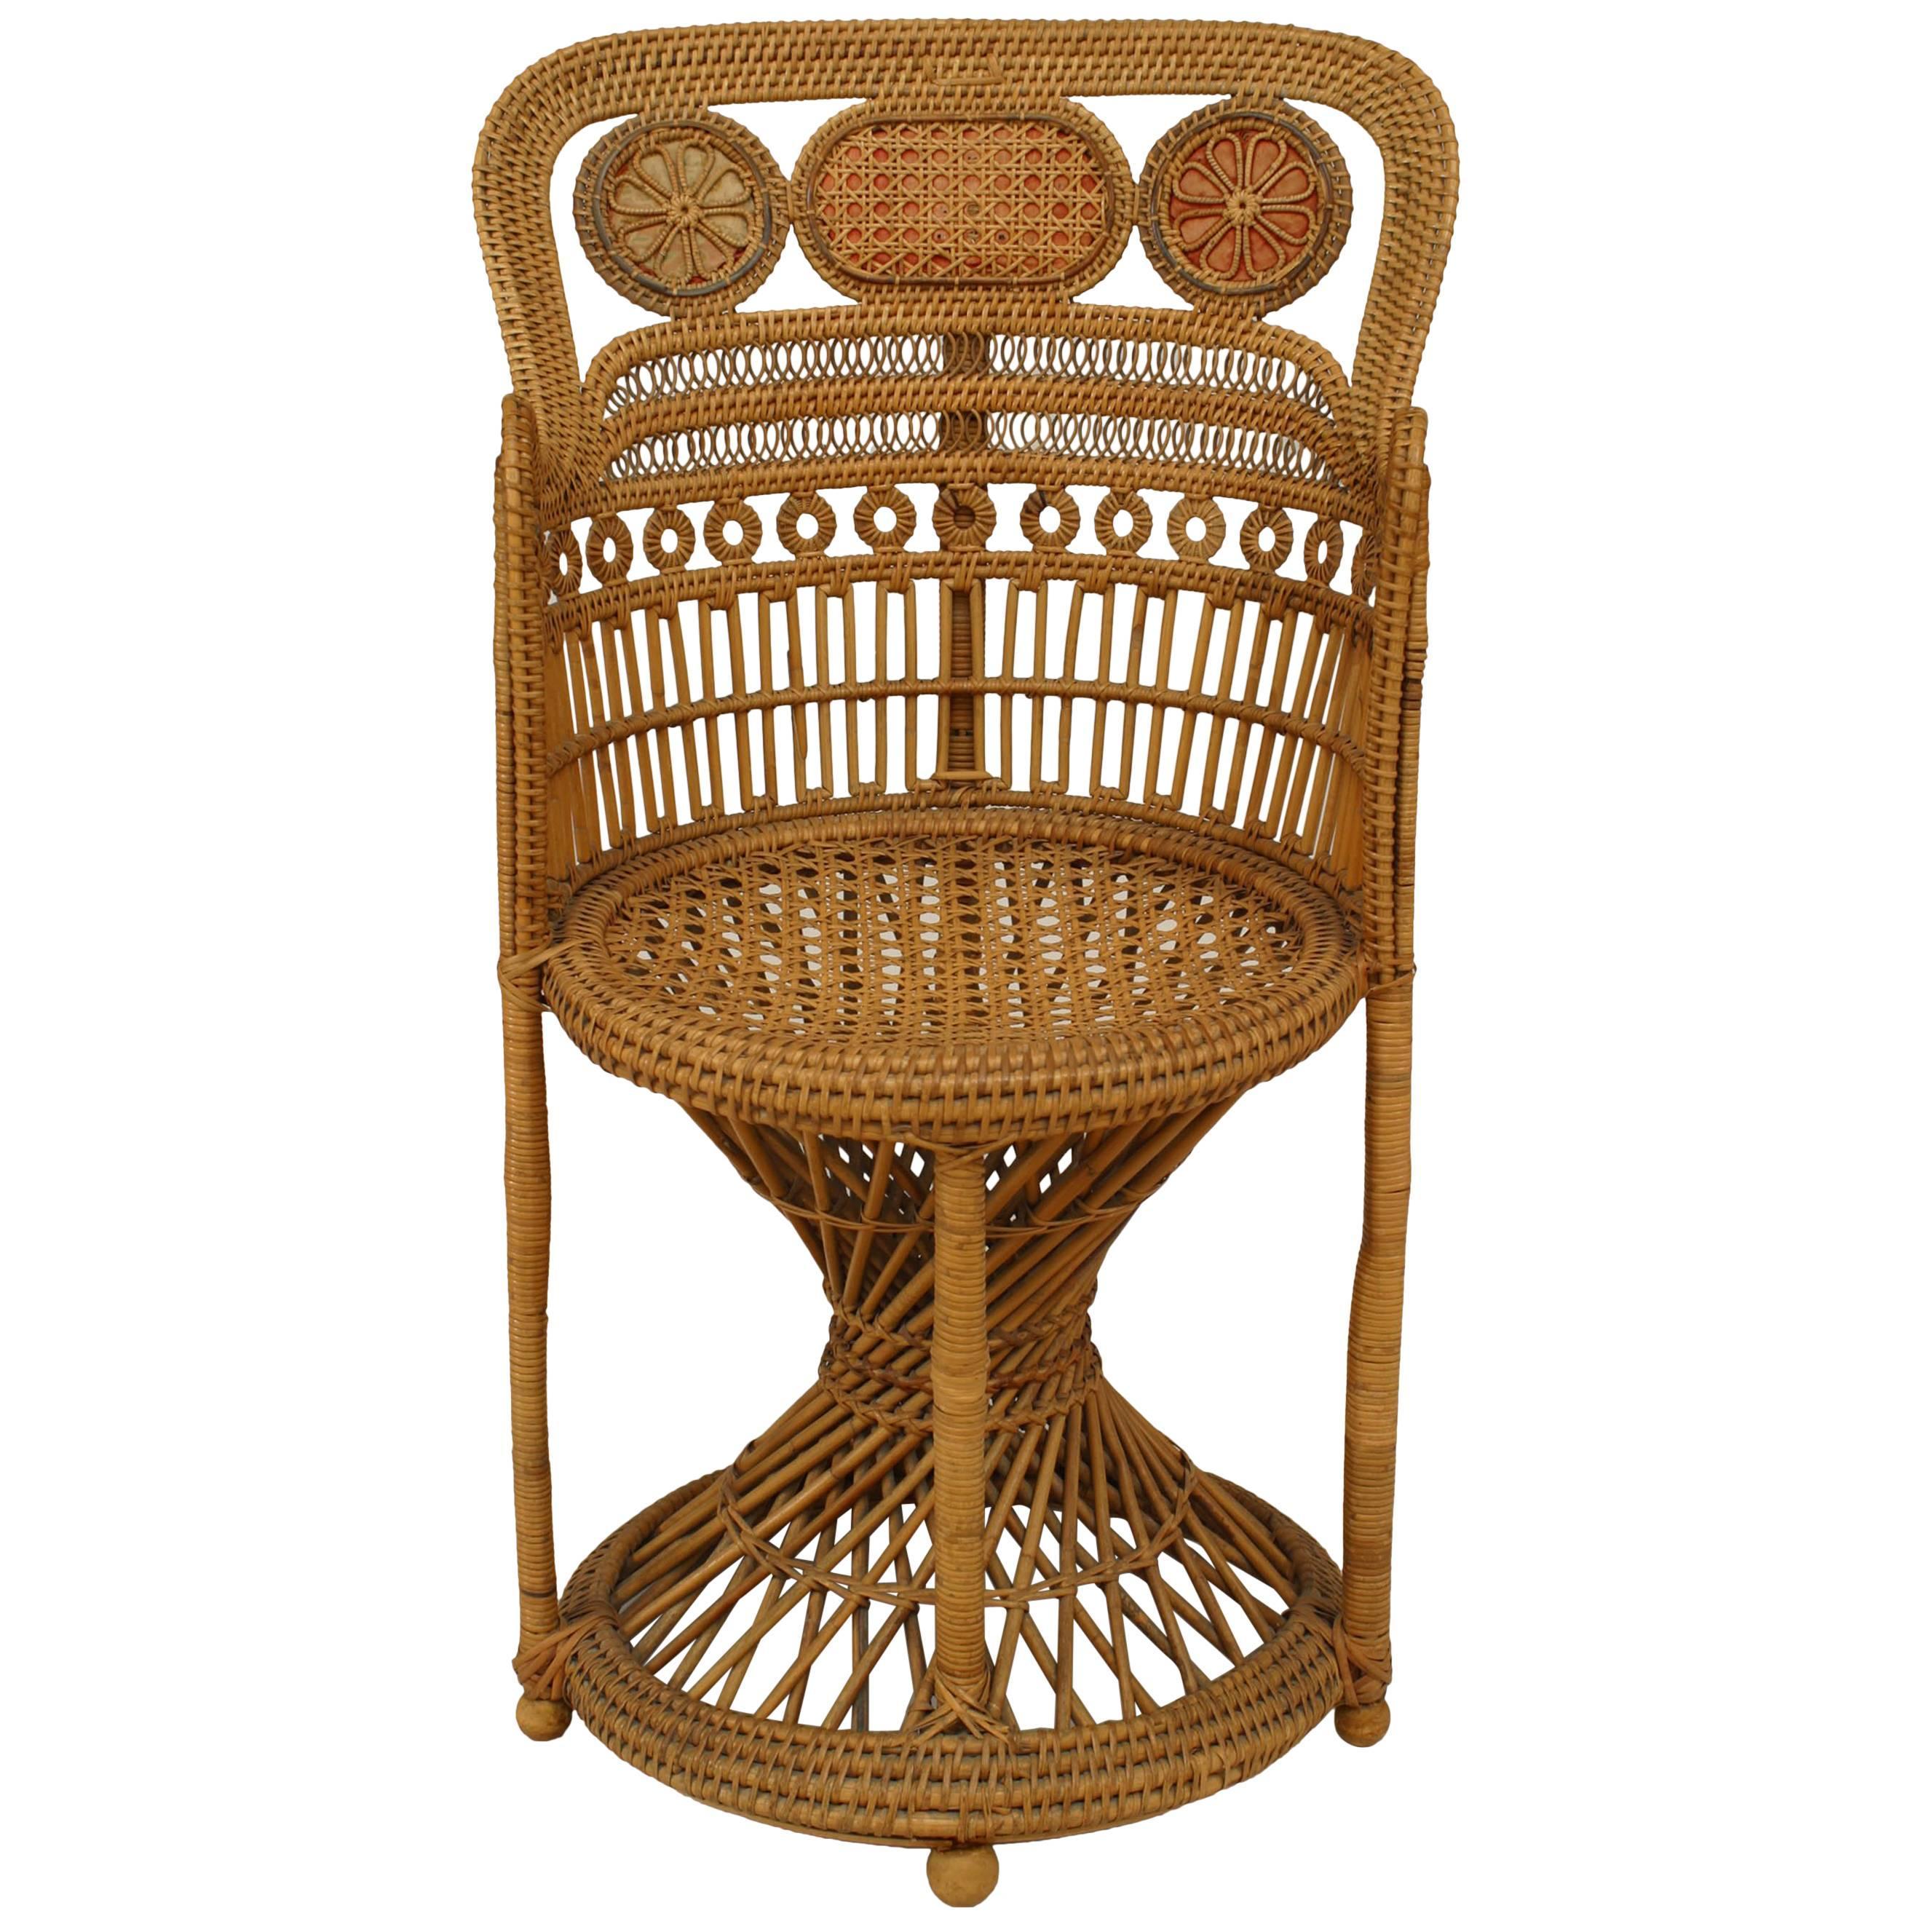 English Regency Style, '19th Century' Brighton Design Wicker Armchair